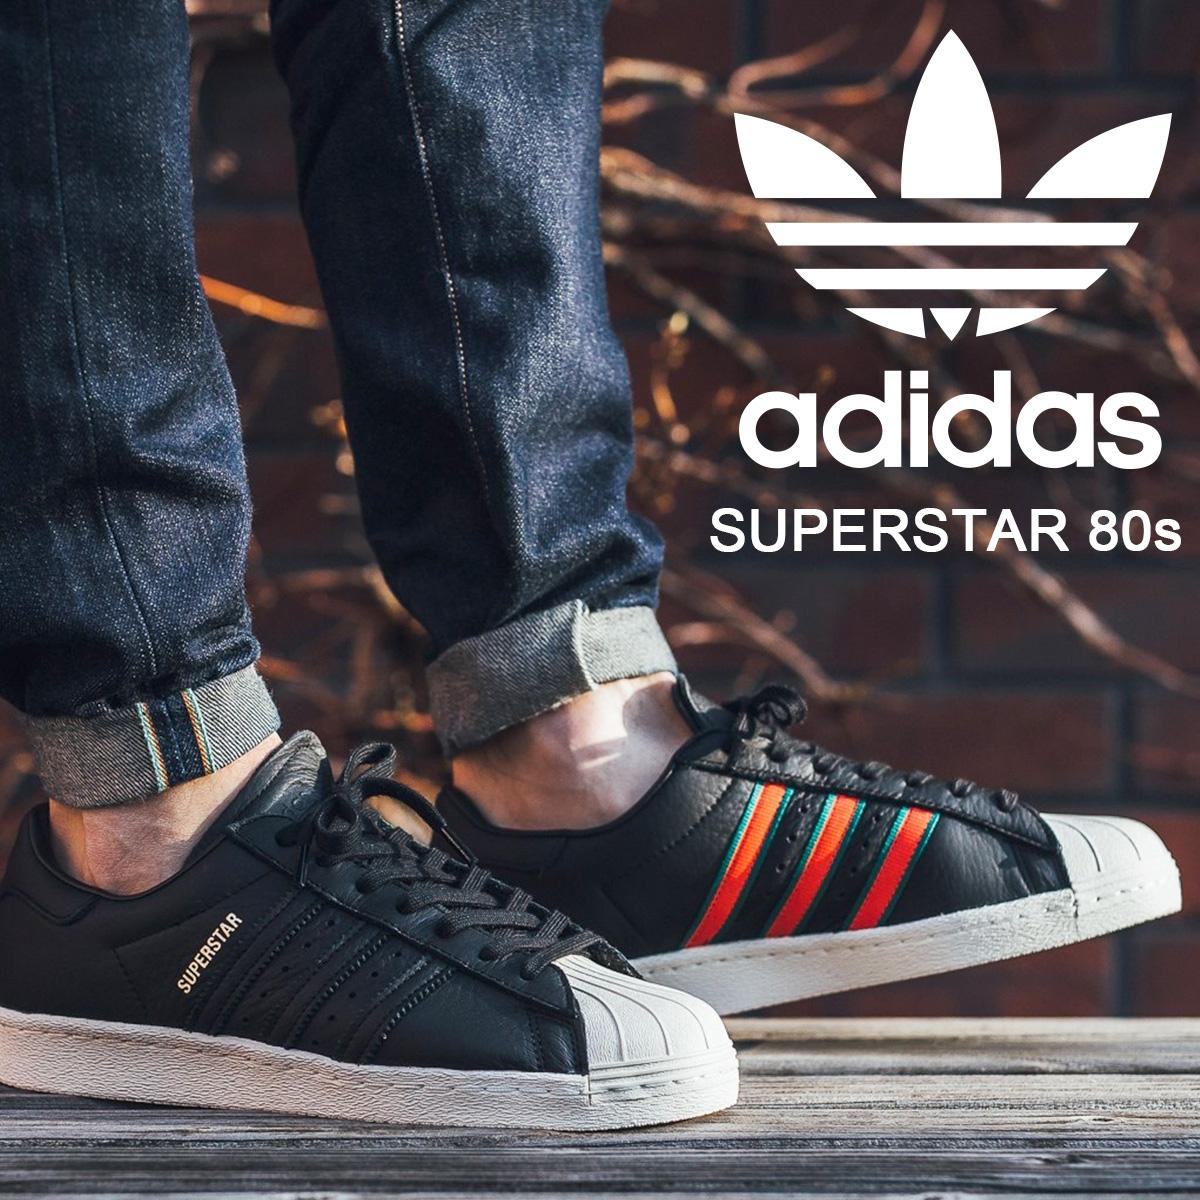 4457a56b7da6d adidas Originals SUPERSTAR Adidas superstar 80s sneakers men CQ2656 black  originals [2/13 Shinnyu load] [182]